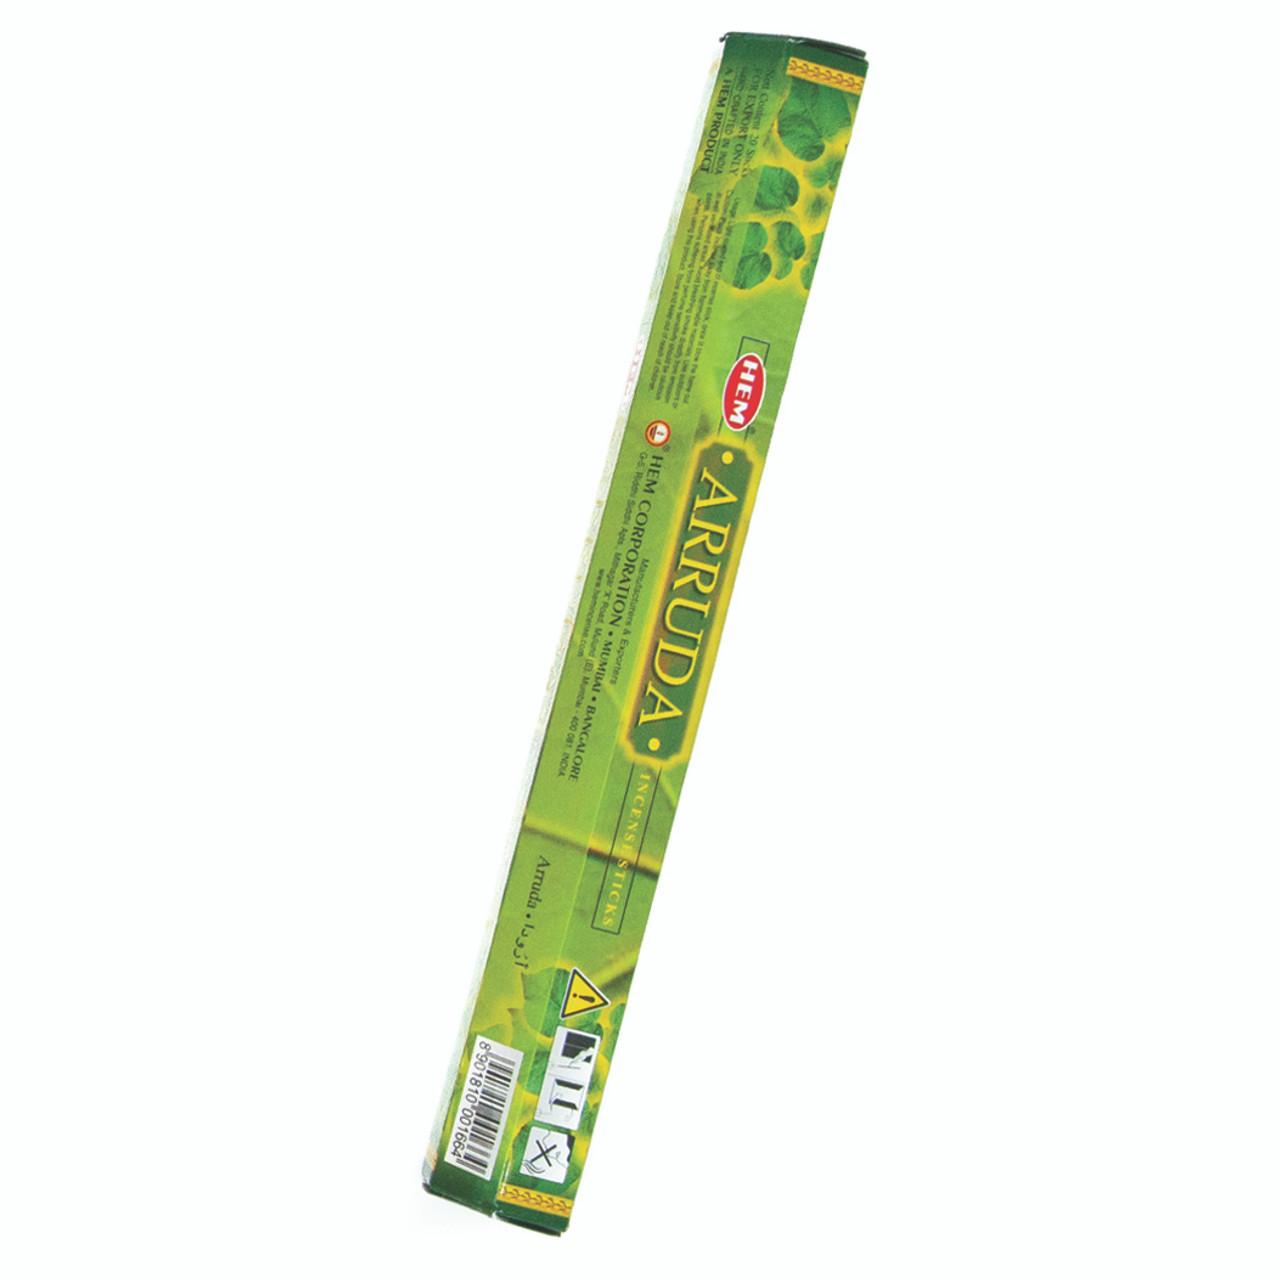 Incienso Exagonal Ruda (Sage Incense Sticks)